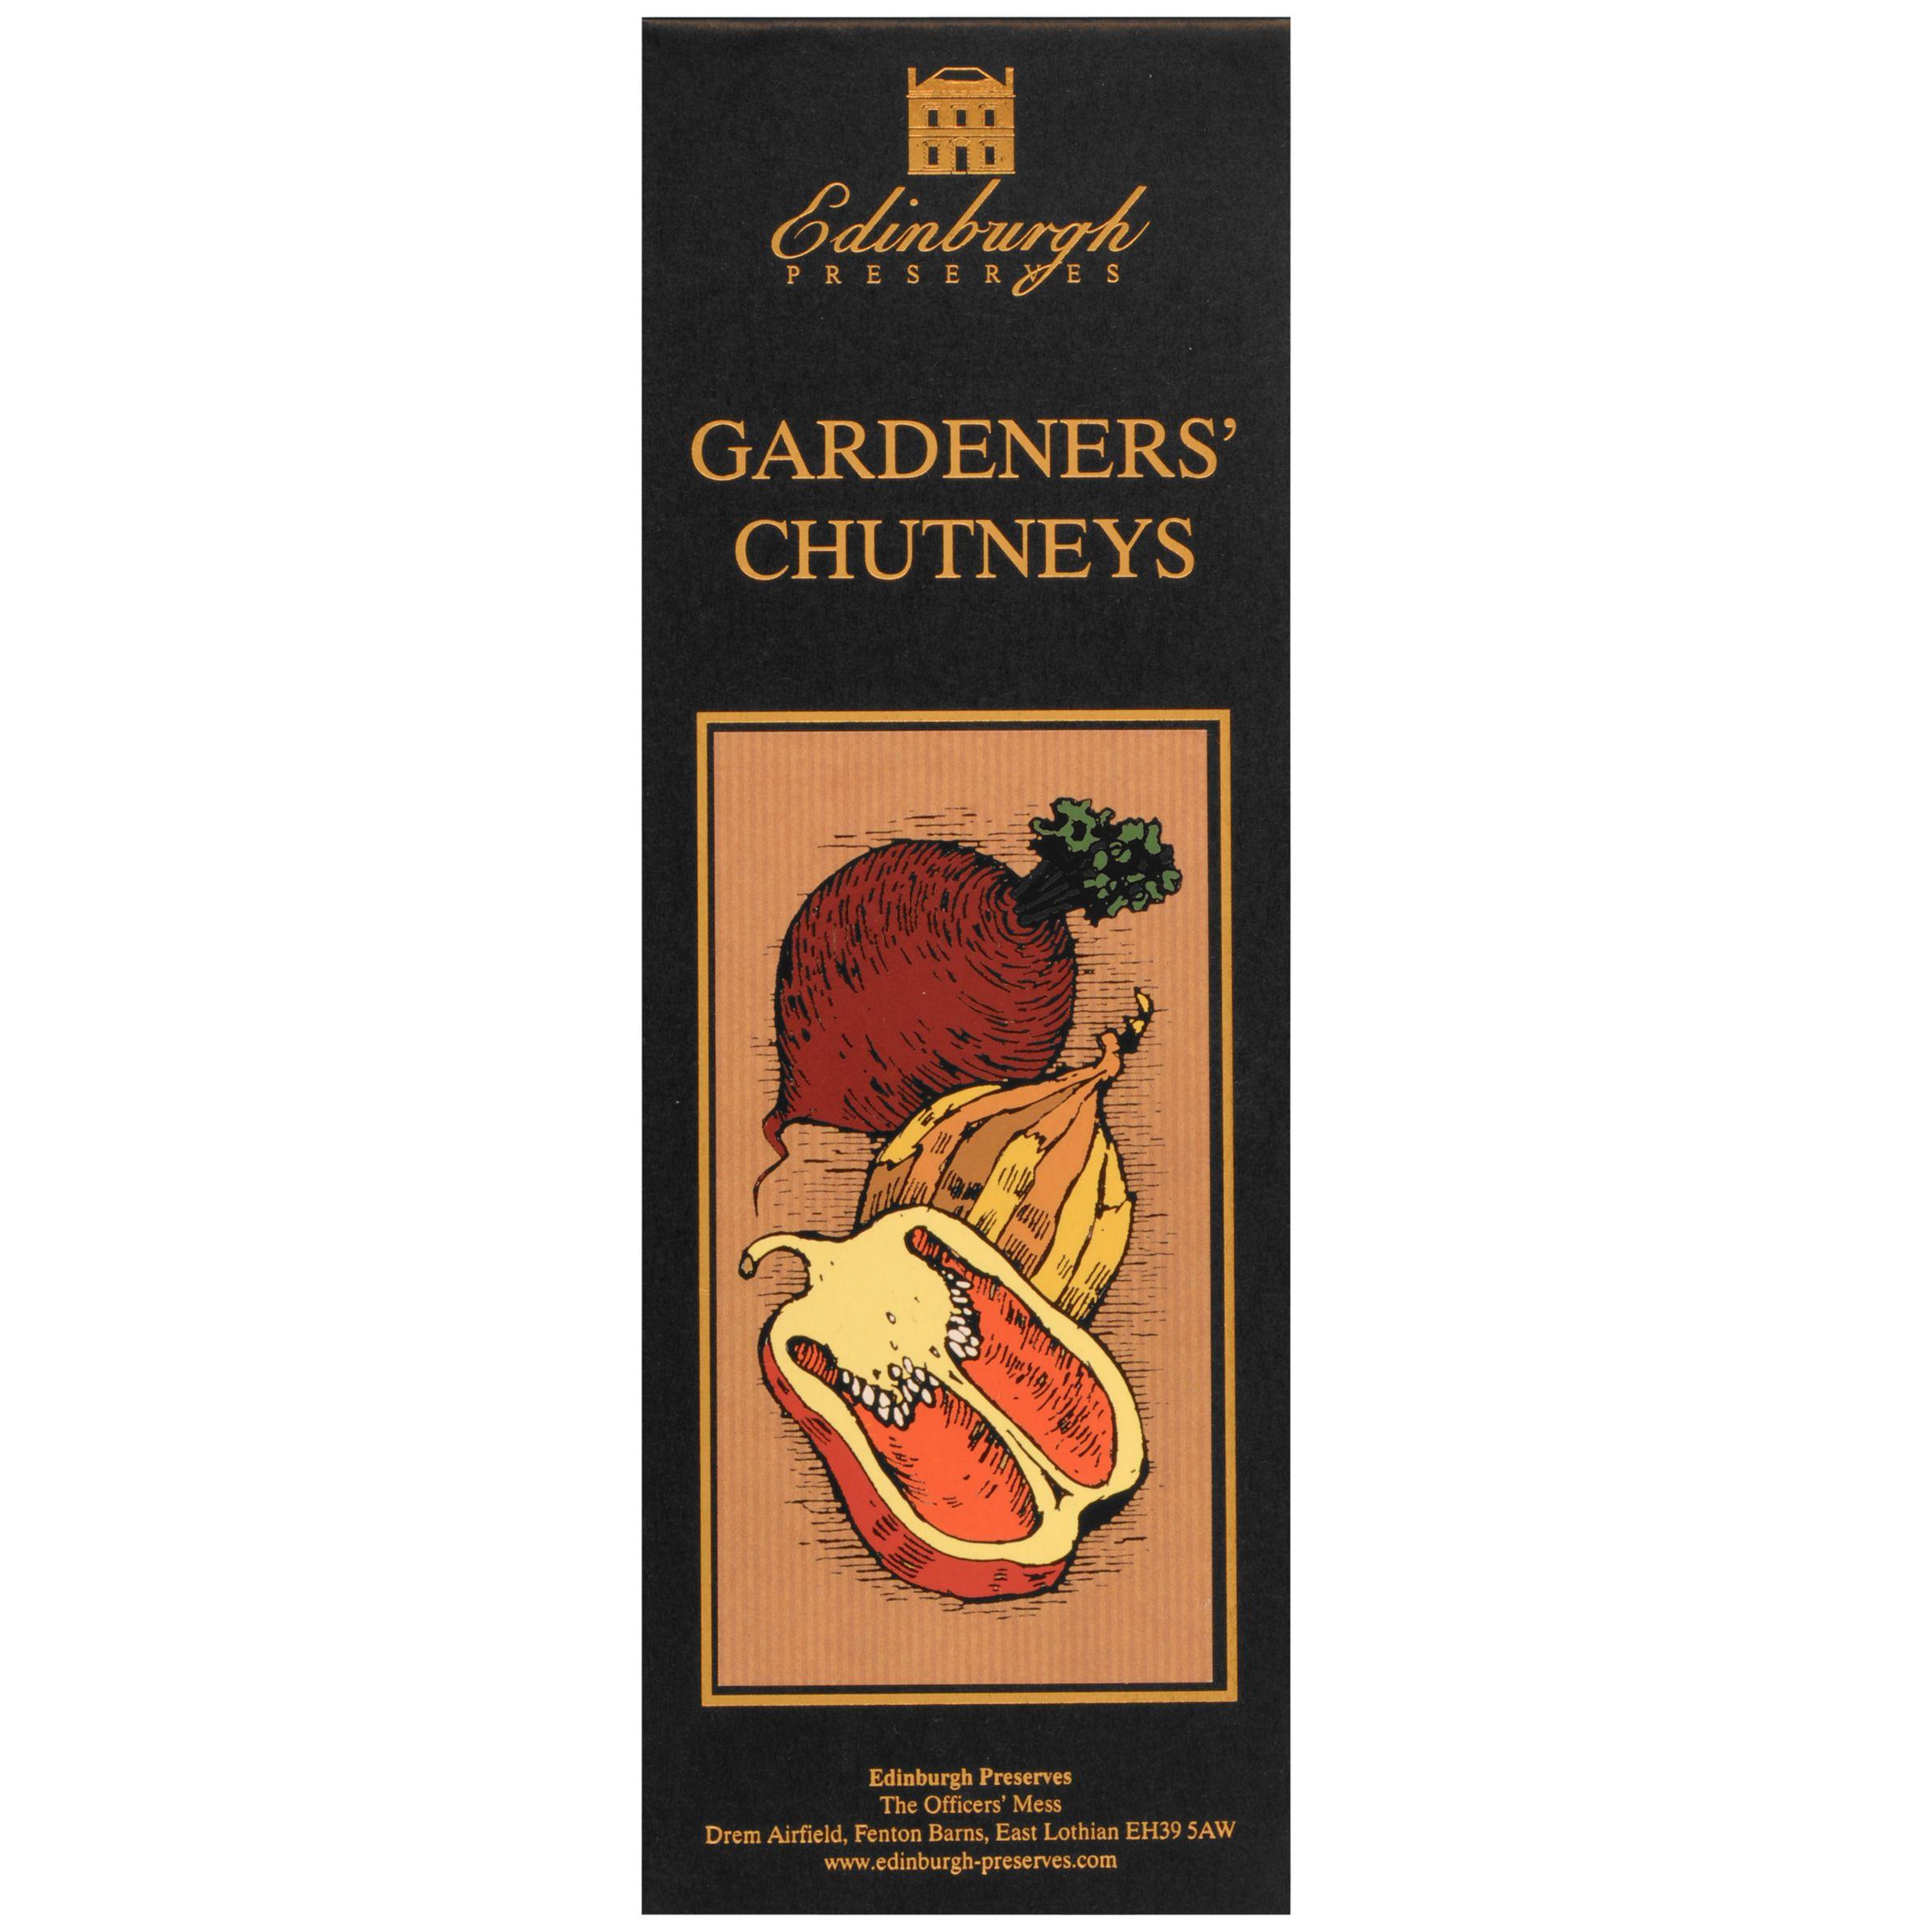 Edinburgh Preserves Edinburgh Preserves Gardeners' Chutneys Set, 600g